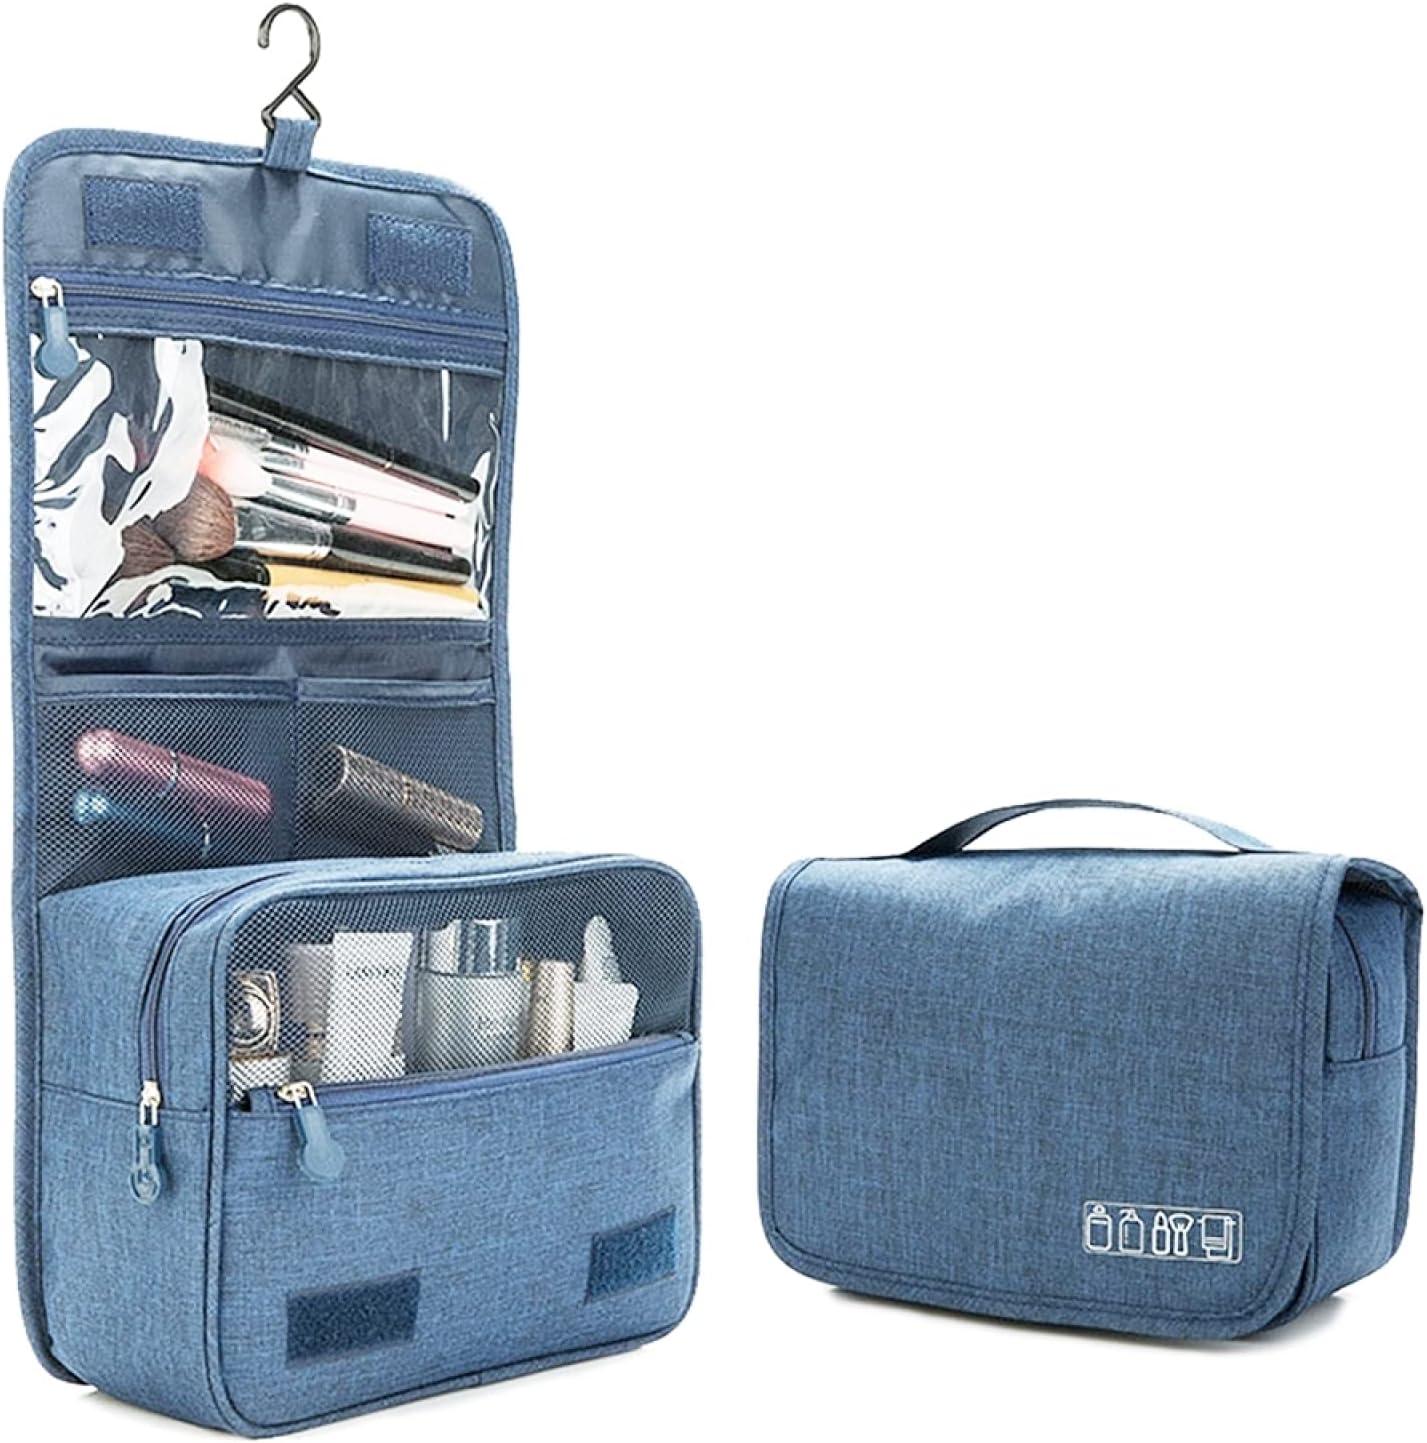 Cubes Portable 5% OFF Large Capacity shop Simple Multi-function Bag Organize